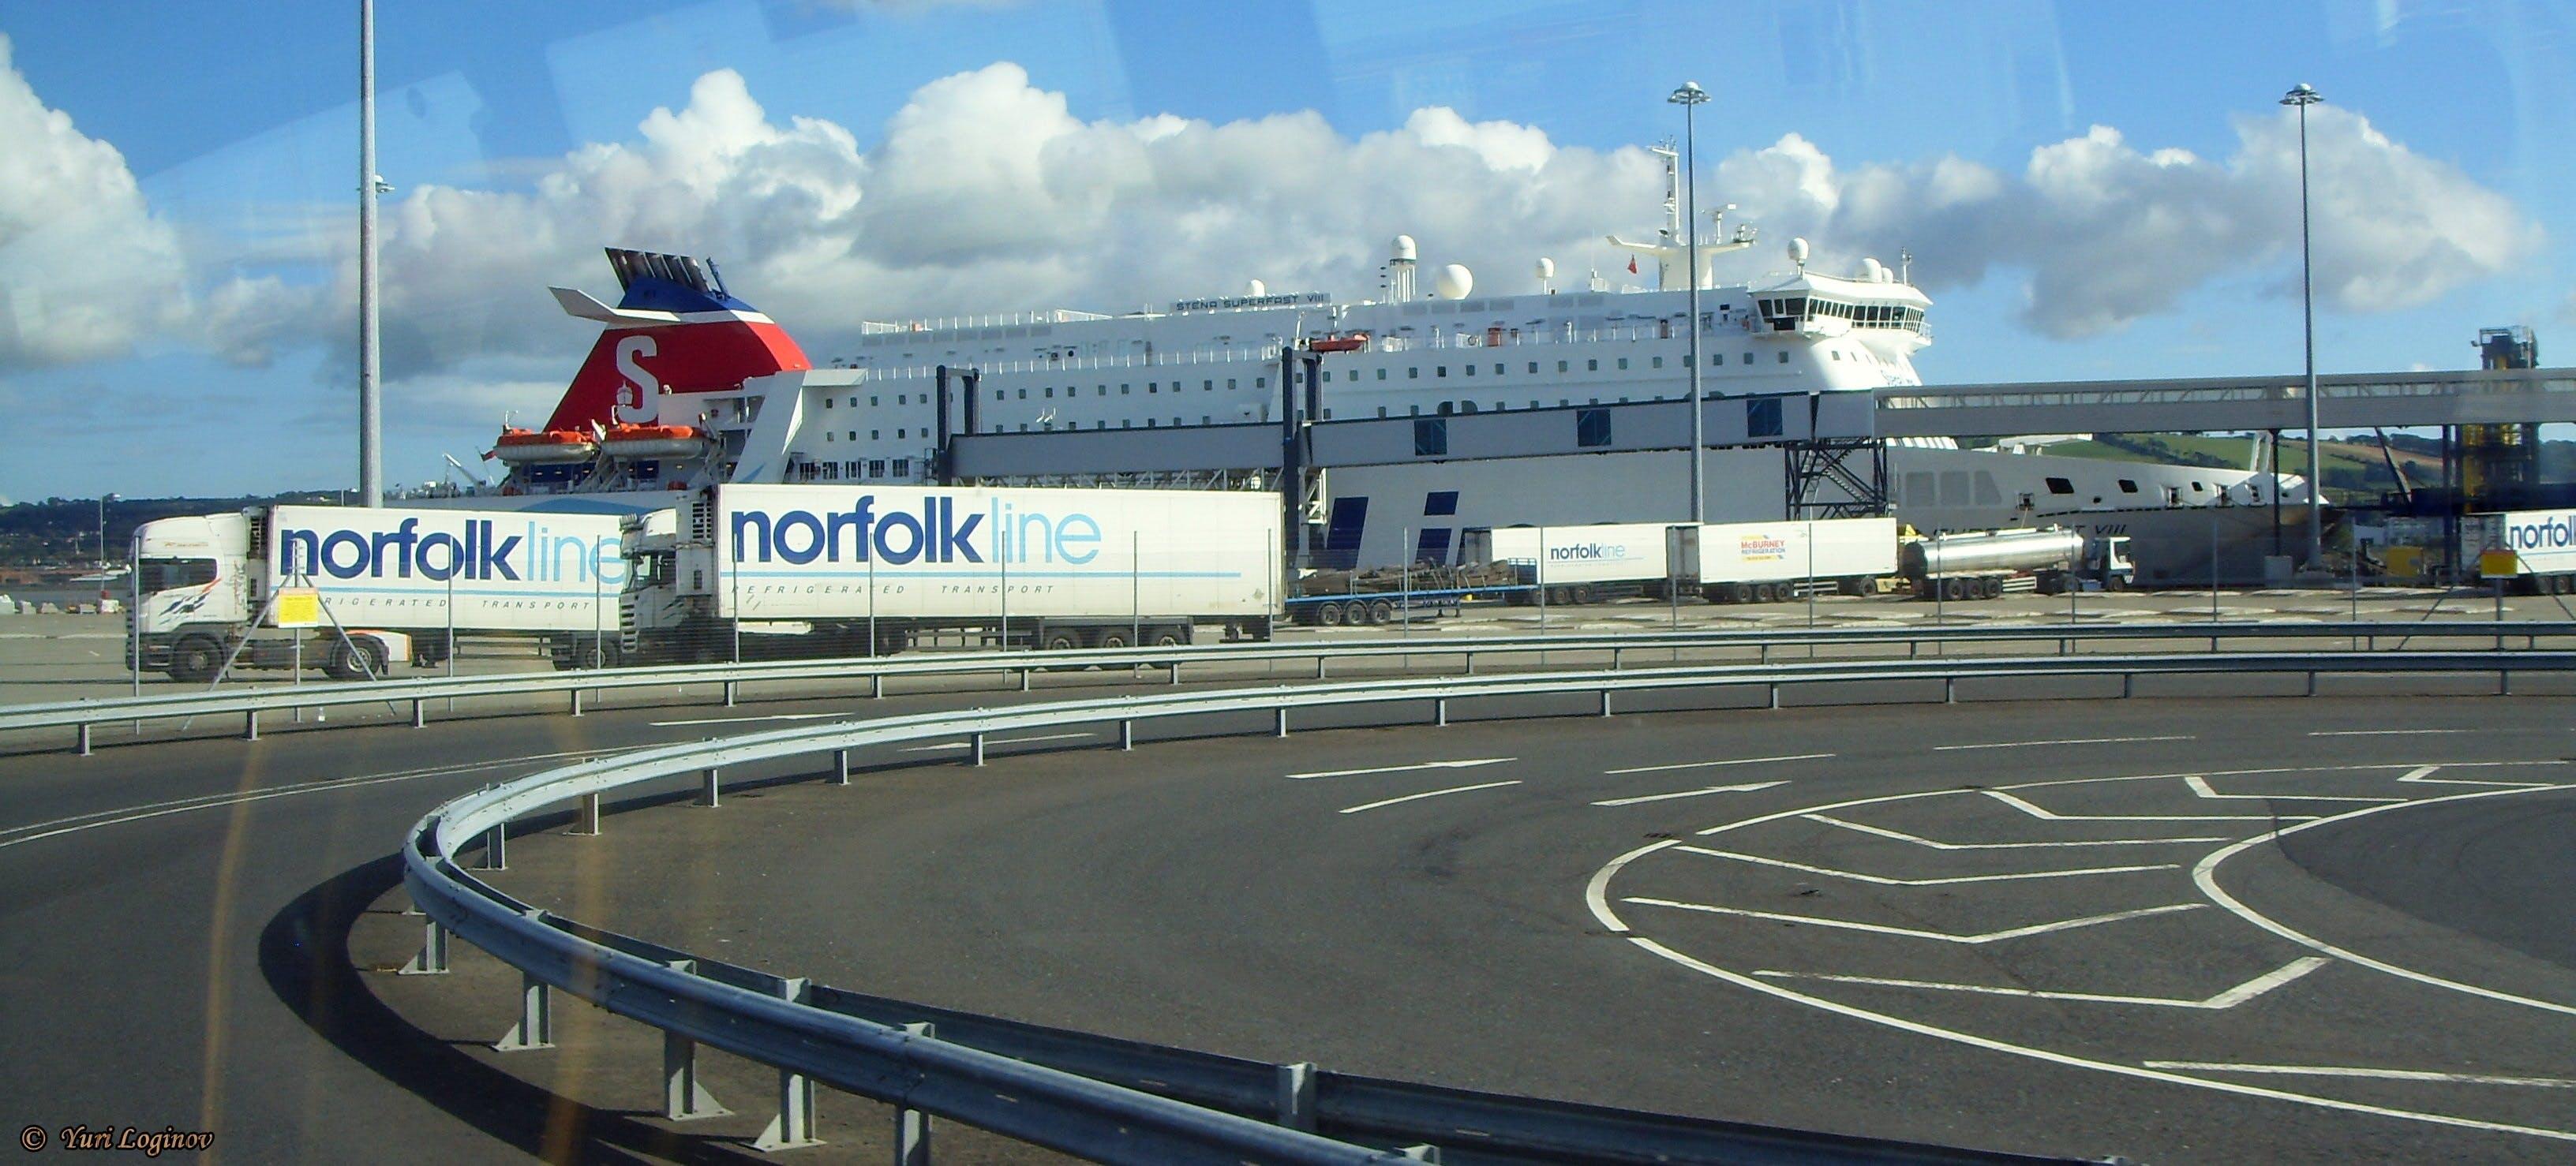 Free stock photo of united kingdom, Northern Ireland, Belfast Lough, Belfast Harbour